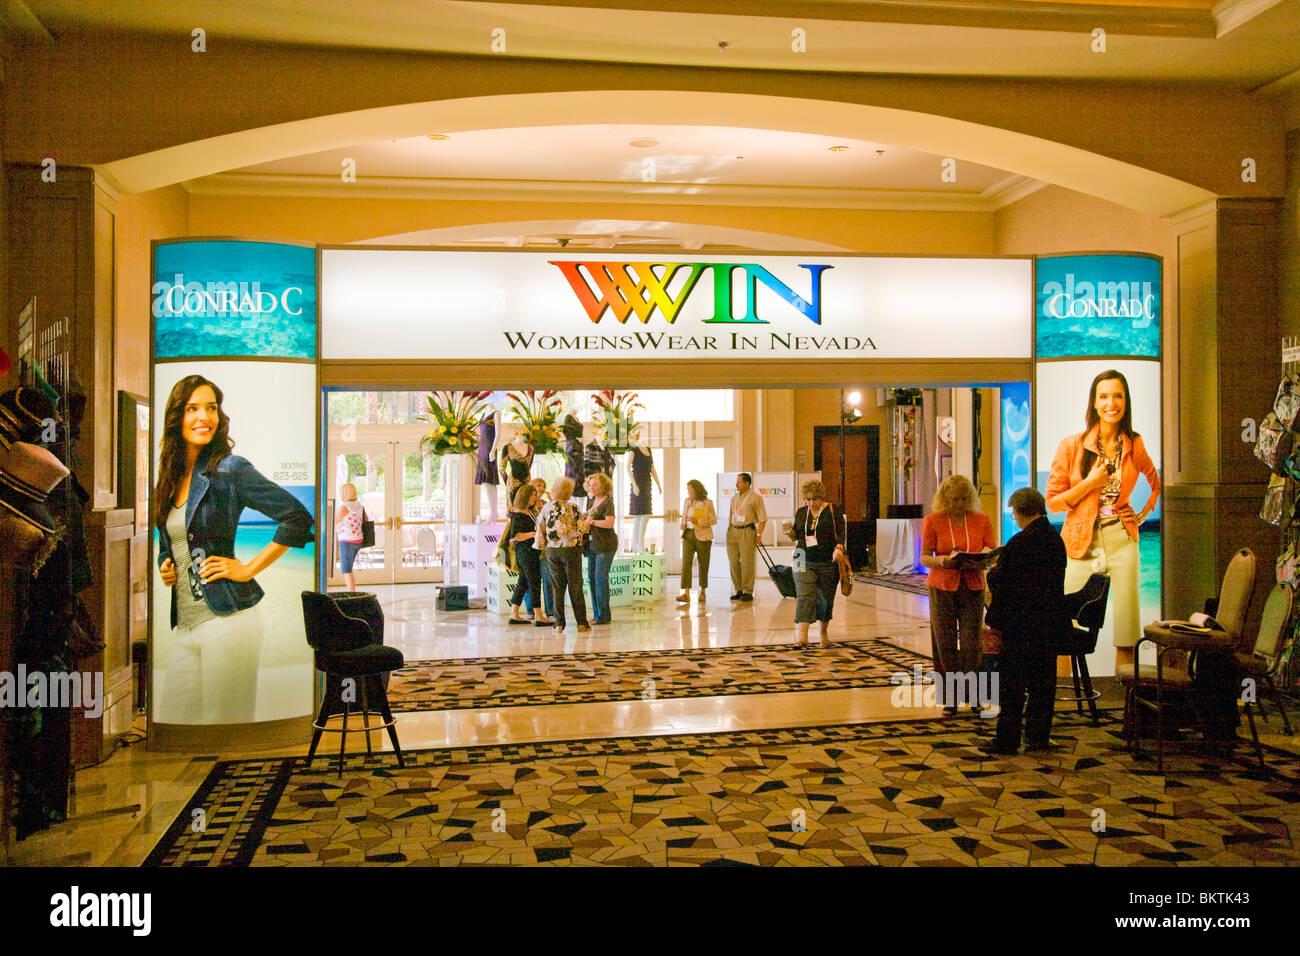 The WOMENS WEAR IN NEVADA or WINN show - LAS VEGAS, NEVADA Stock Photo